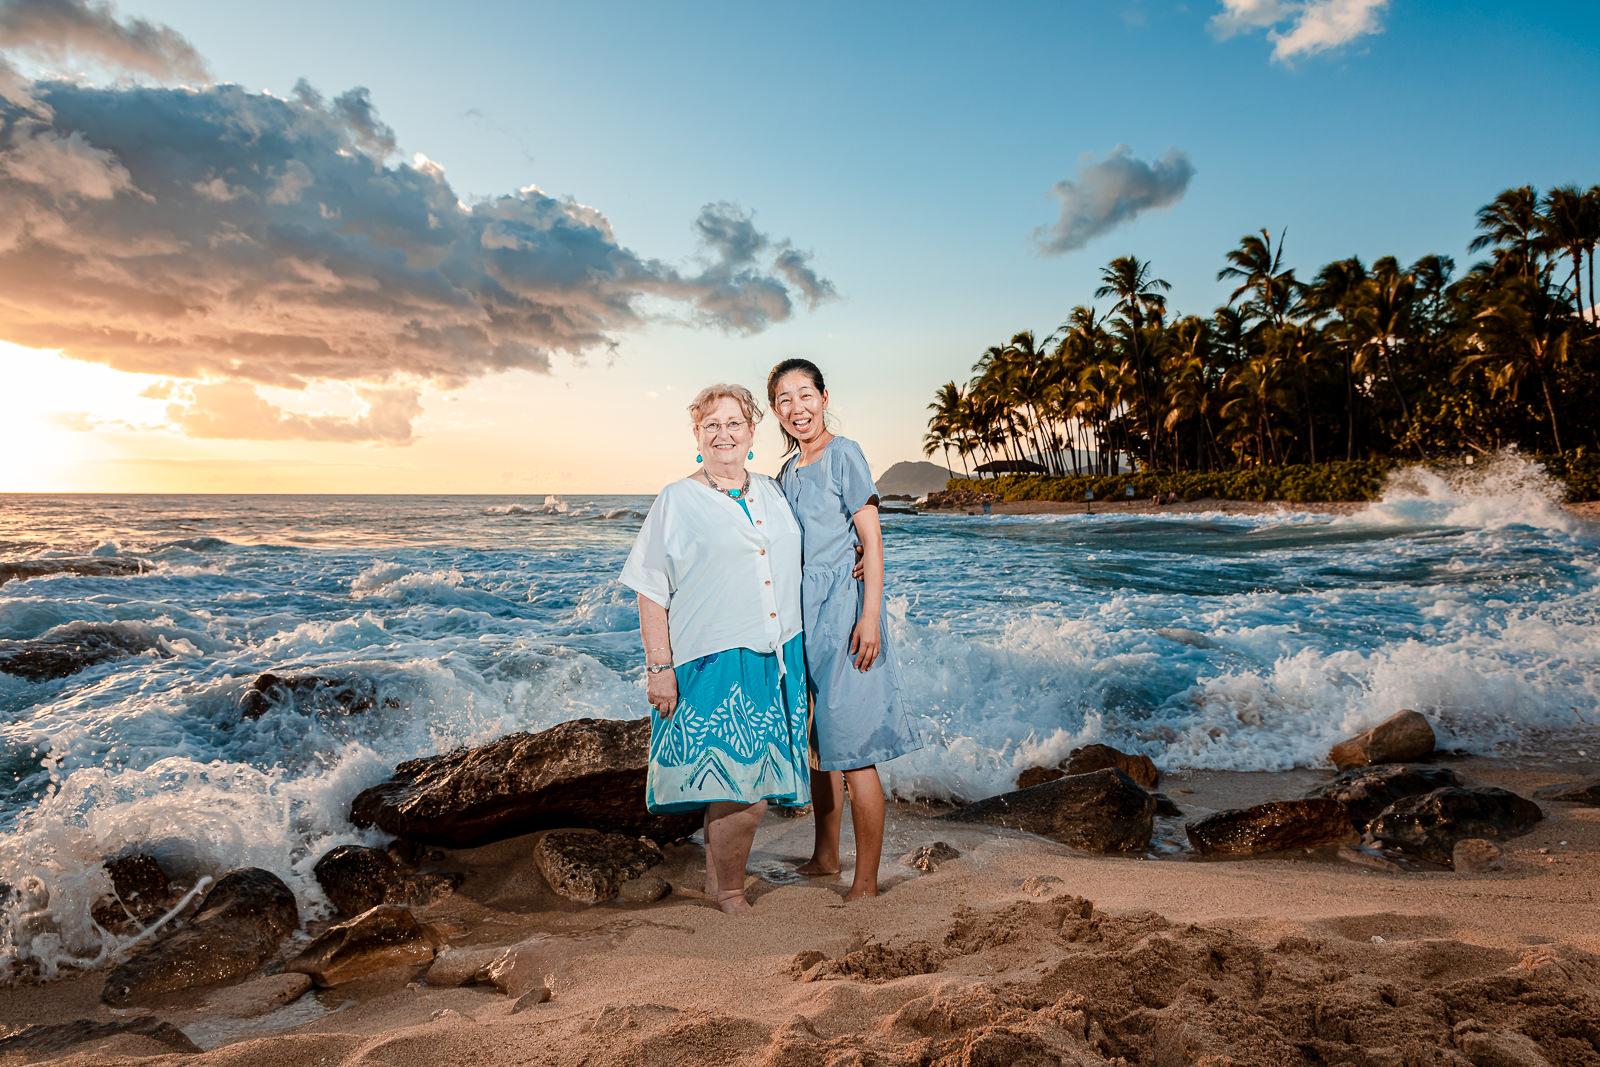 Oahu2019-9538.jpg